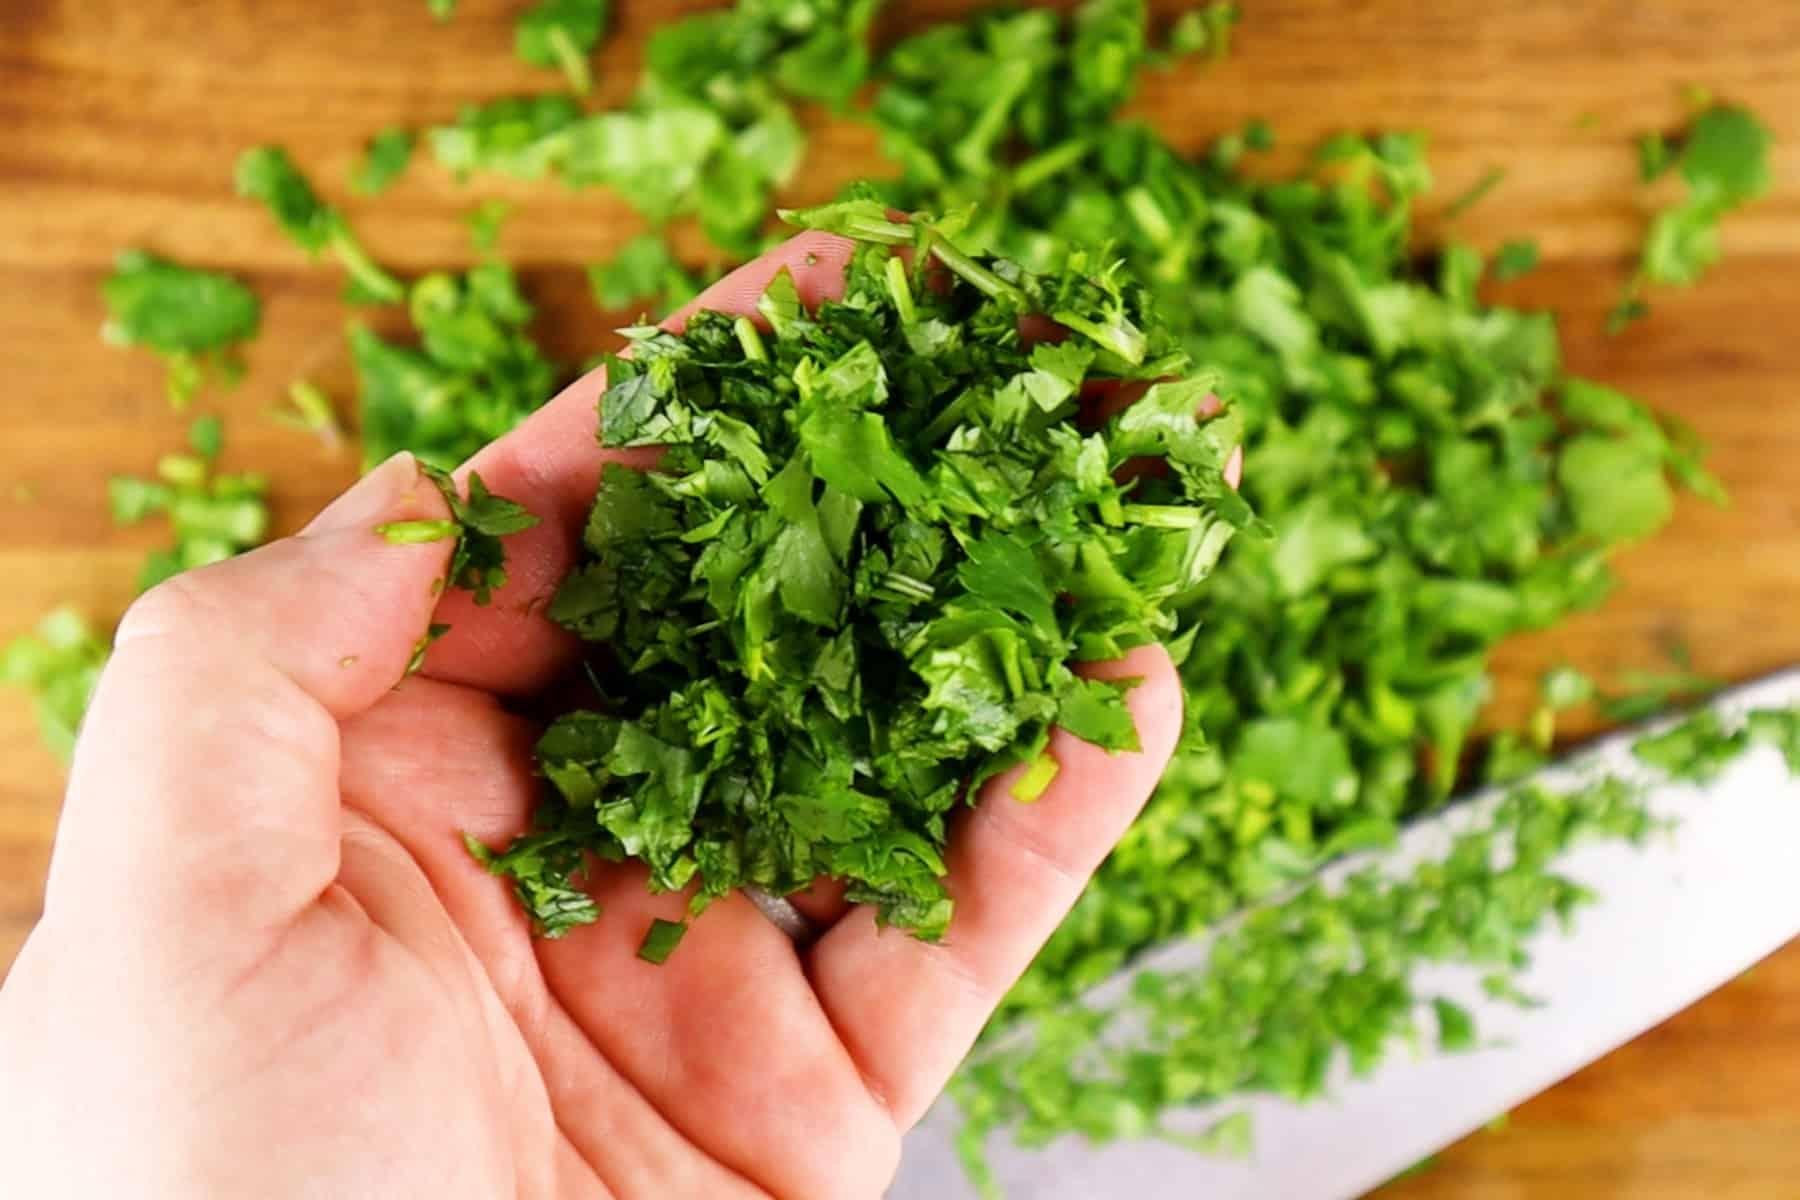 cilantro cuttings in hand